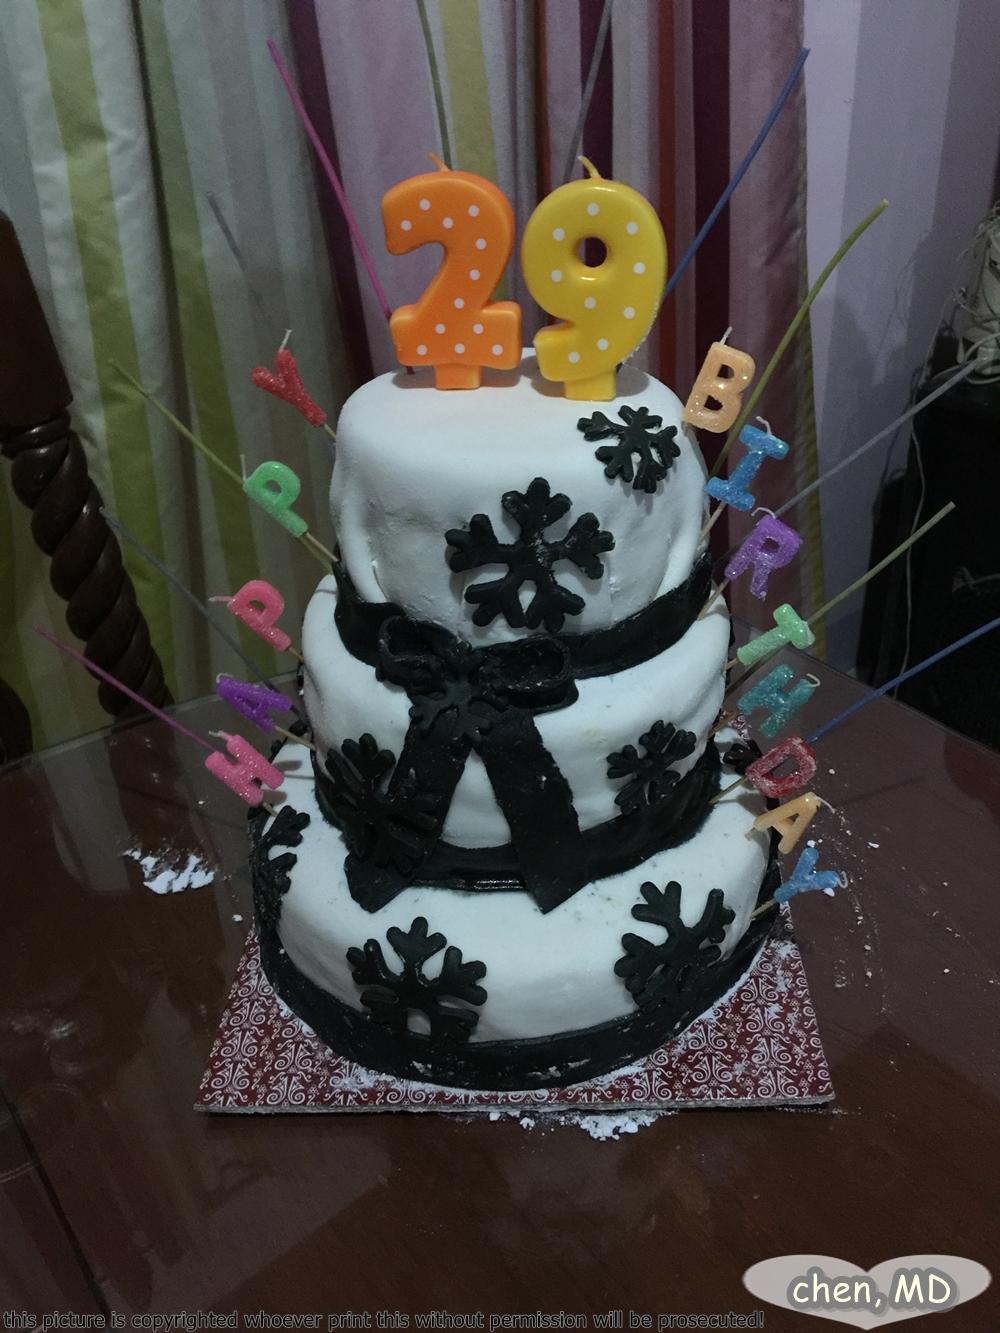 29 Year Old Birthday Cake Cake Recipe